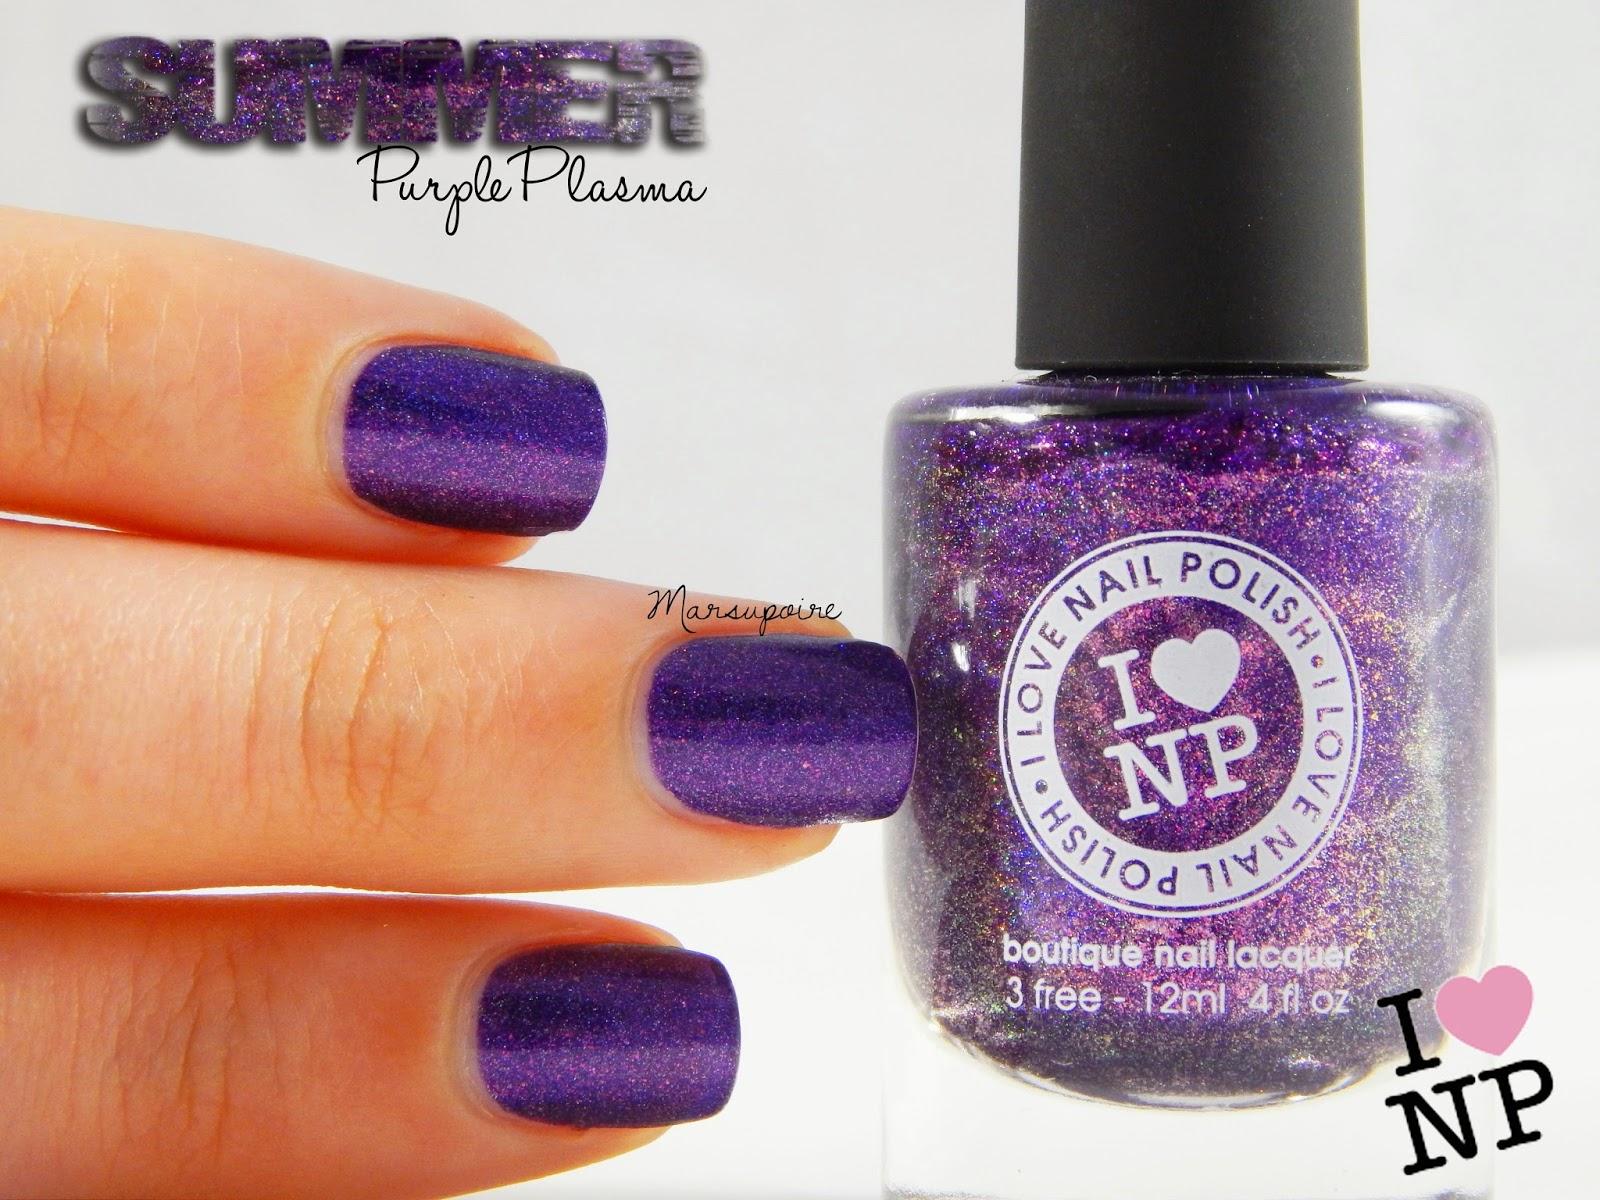 Vernis_ILNP_purple plasma_1